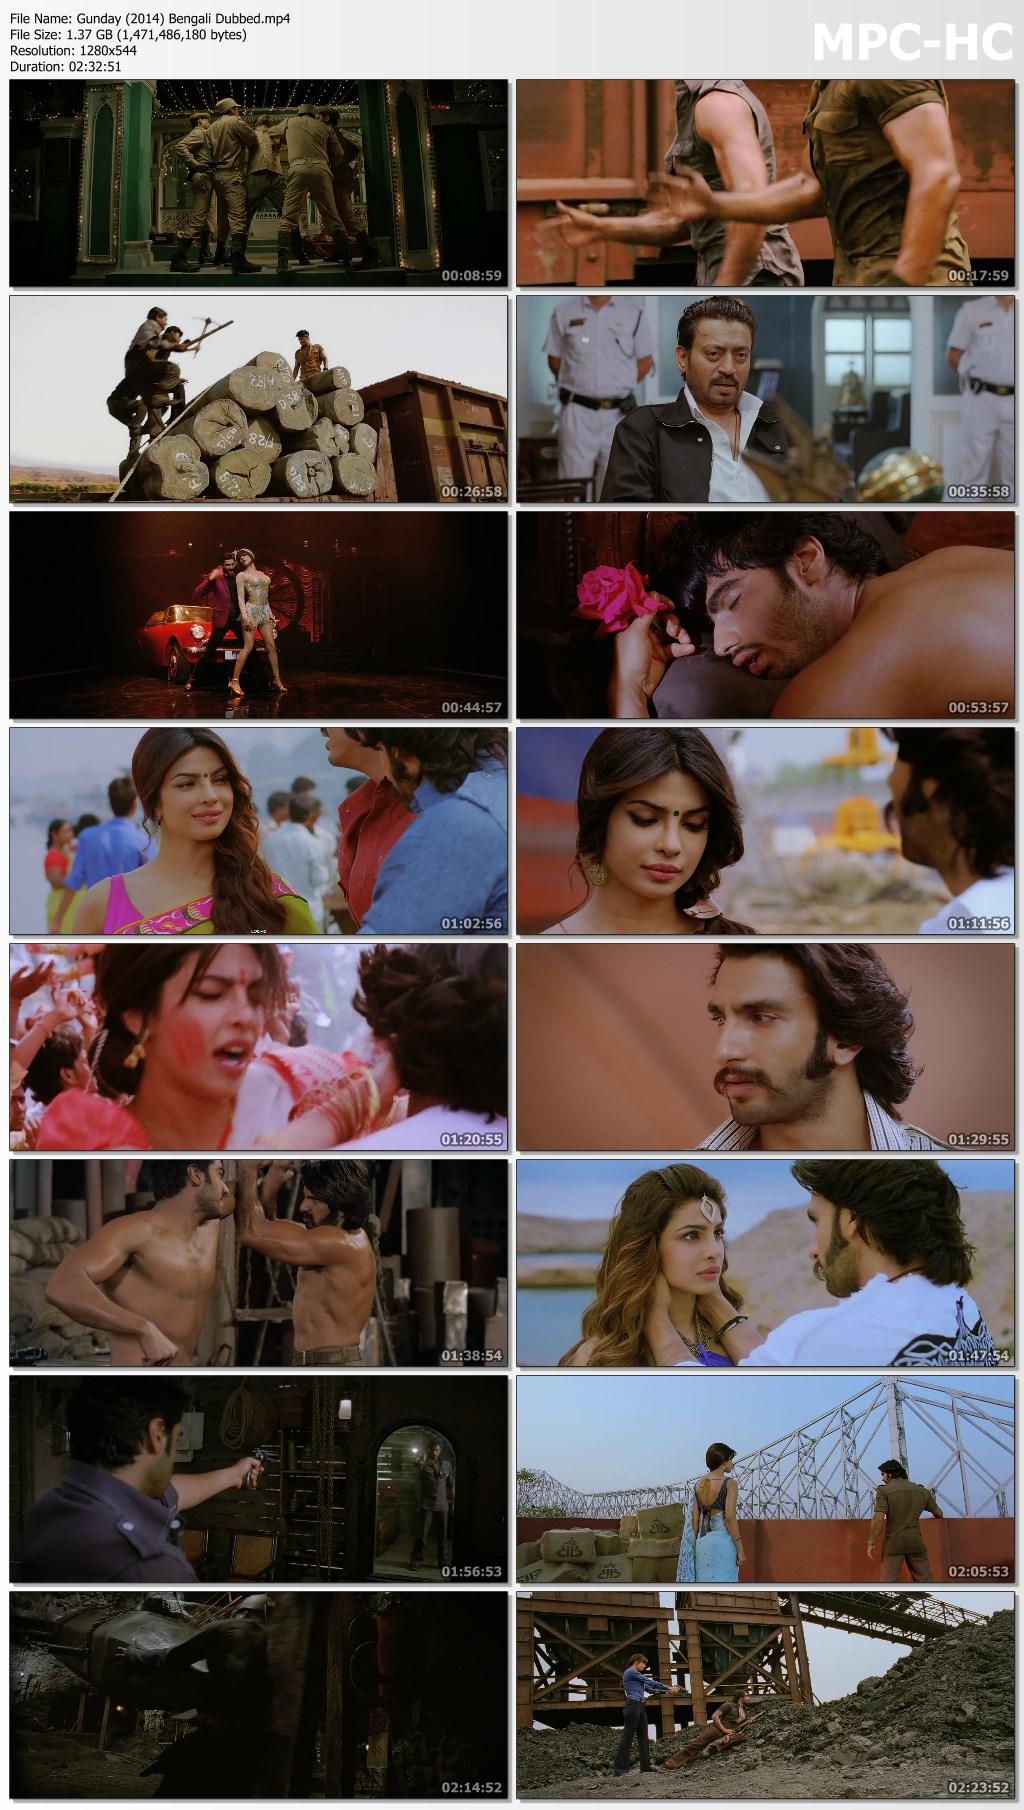 Gunday (20)